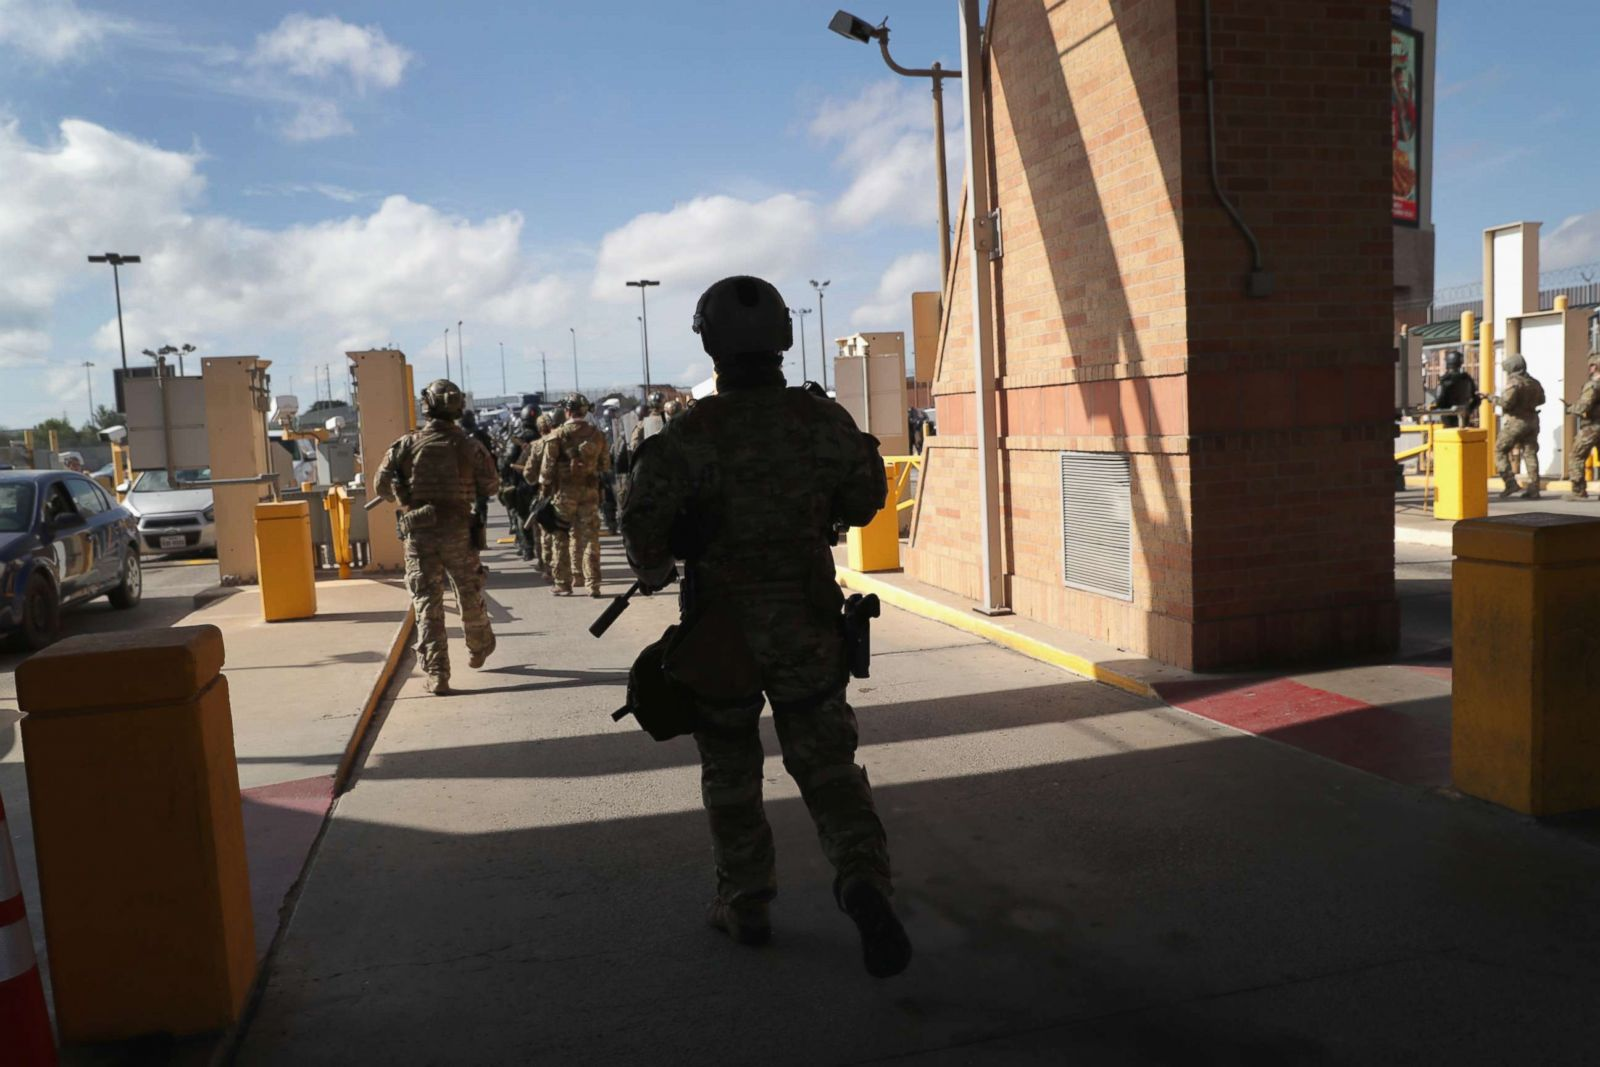 US Border Patrol cancels 'crowd control' training exercise near